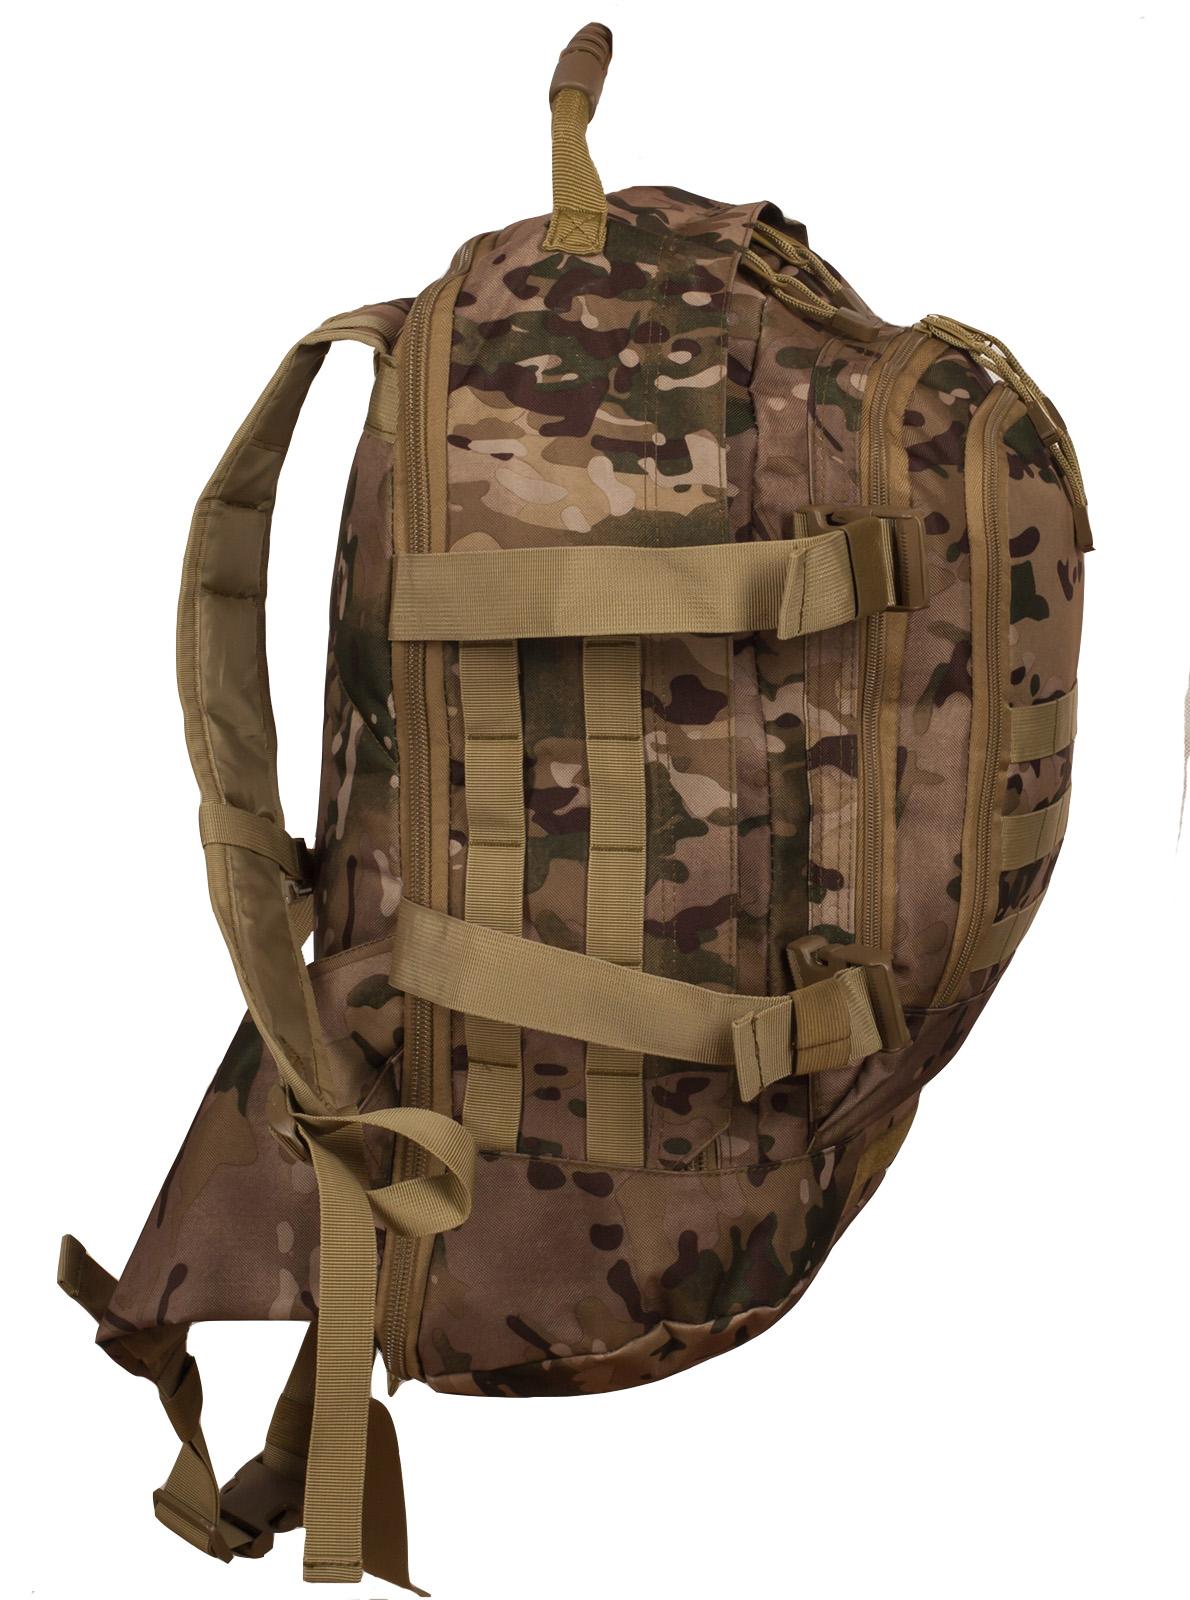 Рюкзак снайпера 3-Day Expandable Backpack 08002A Multicam с эмблемой СССР оптом в Военпро